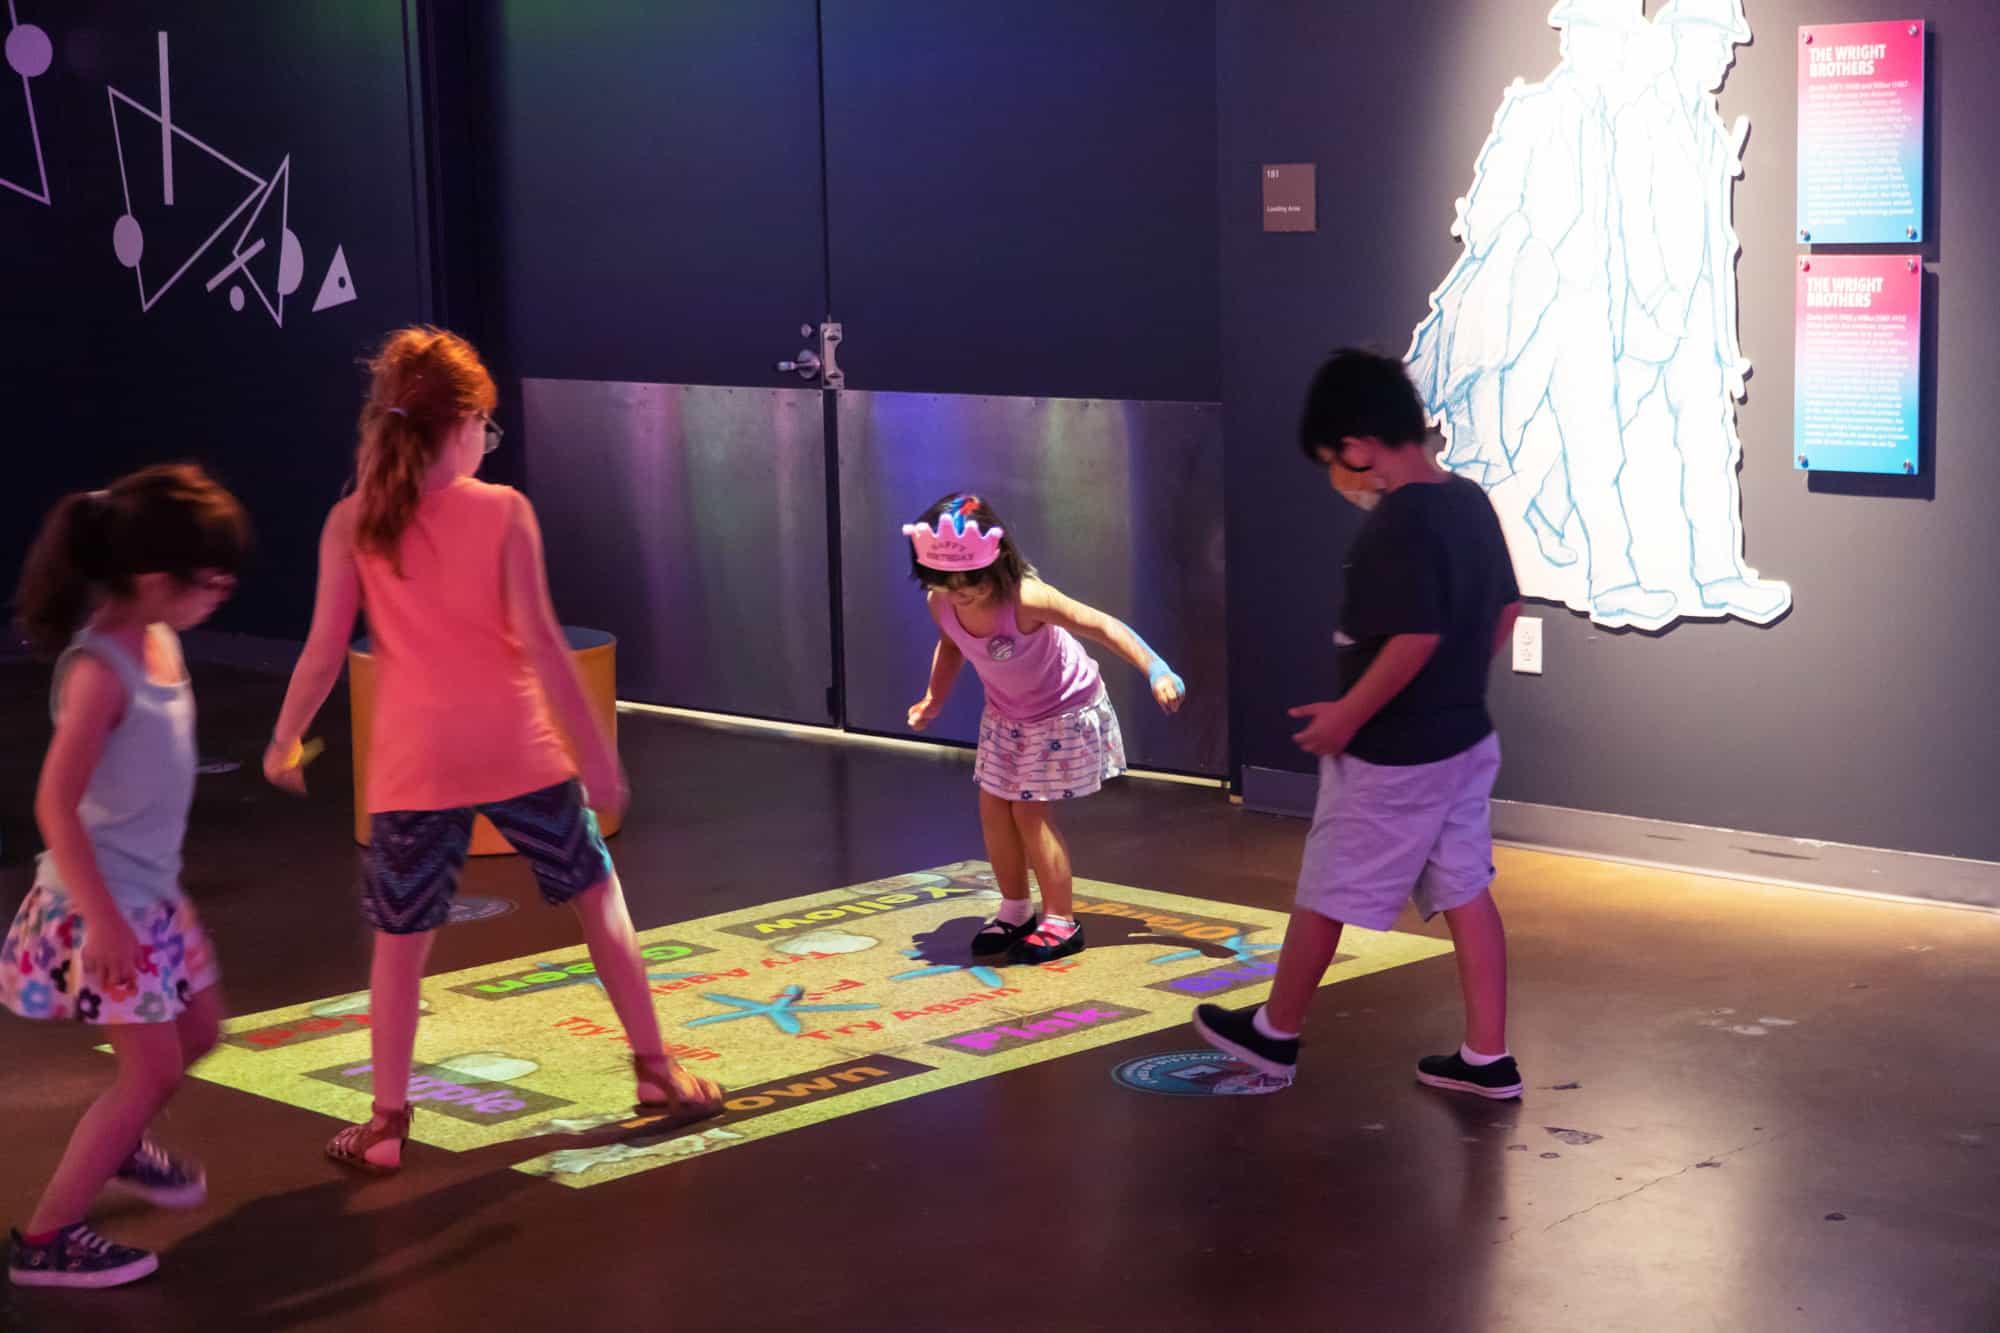 Whiteboard Exhibits floor games san